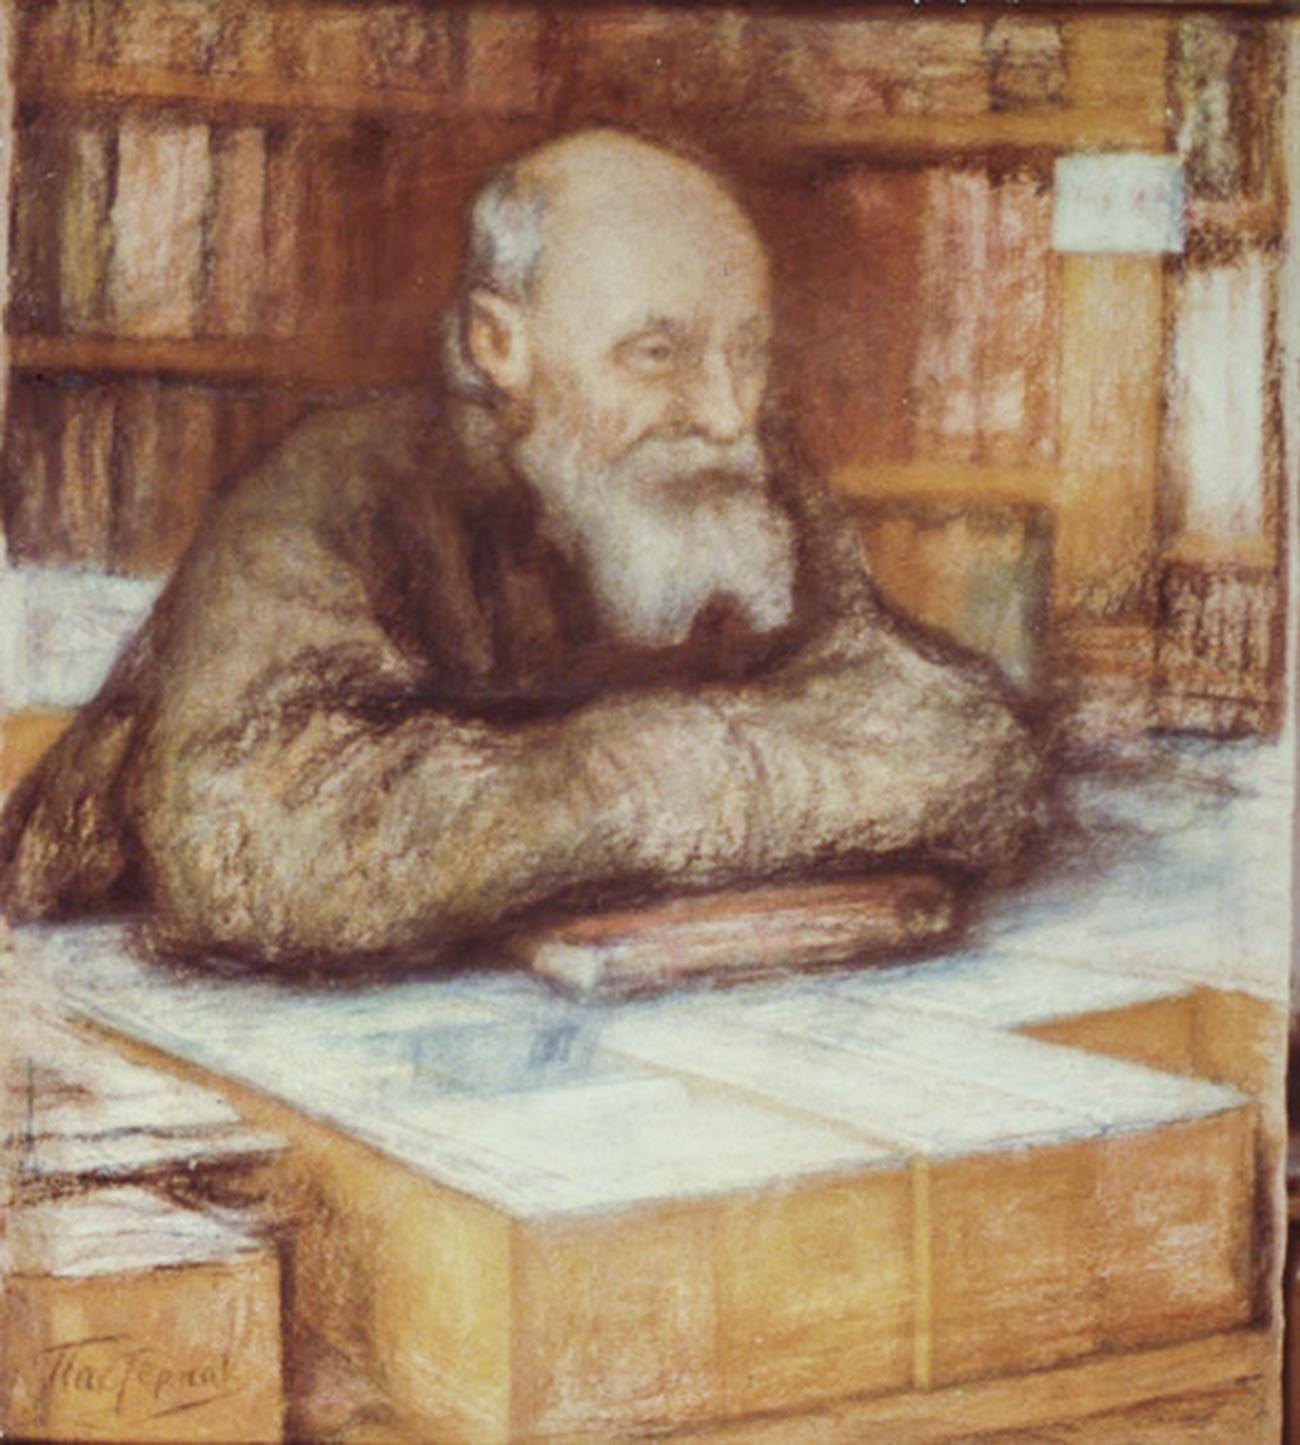 Porträt von Nikolai Fjodorow.